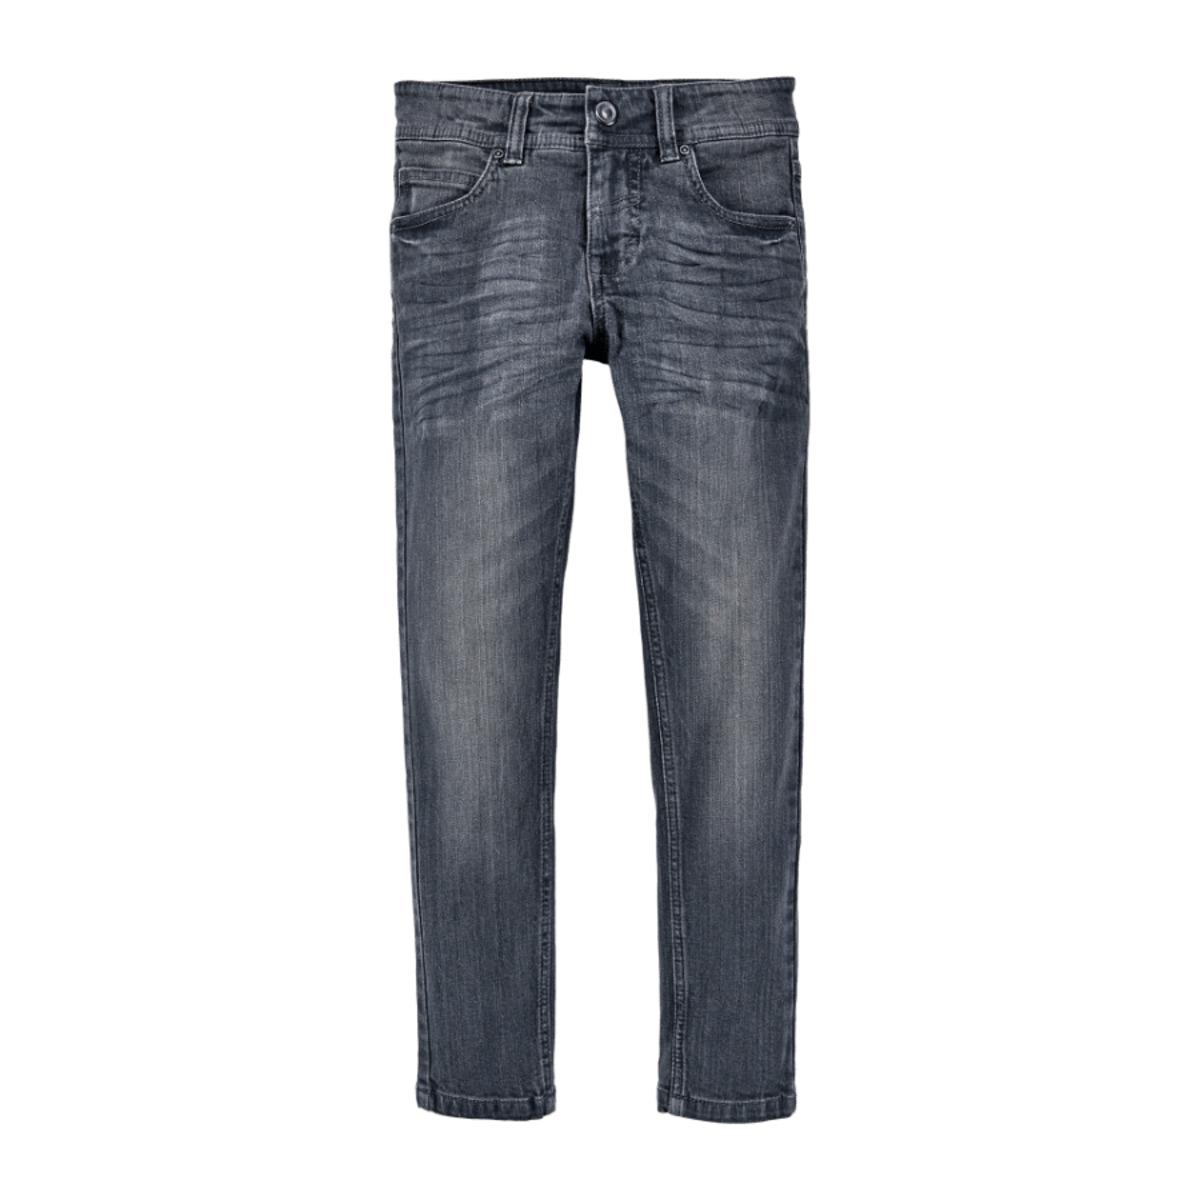 Bild 3 von POCOPIANO     Jeans